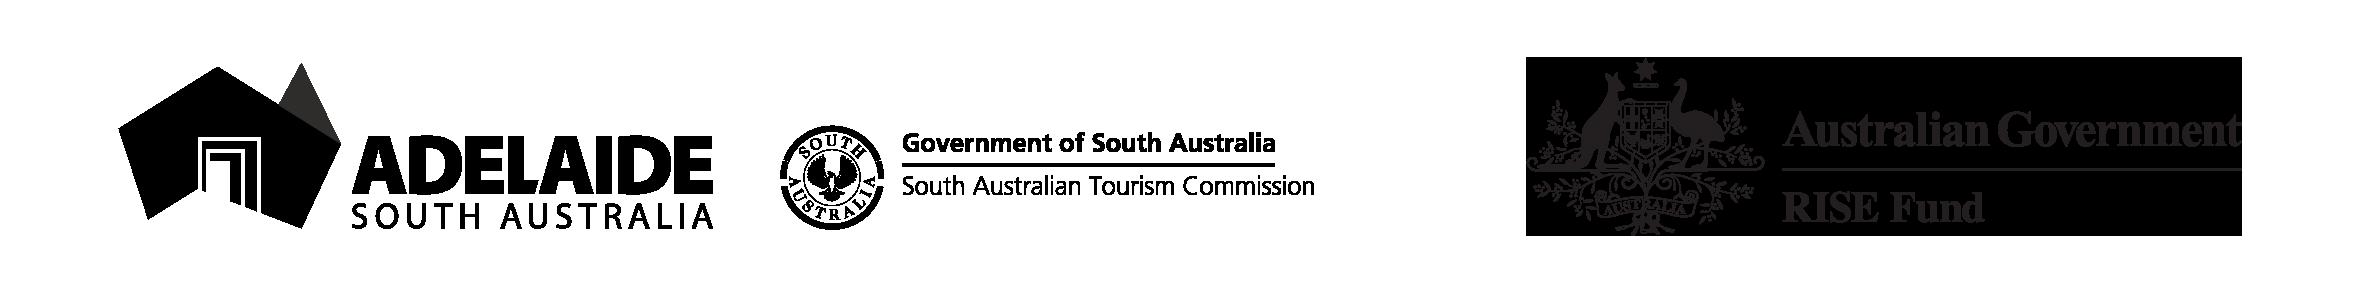 Logo-Acknowledgement-Splash